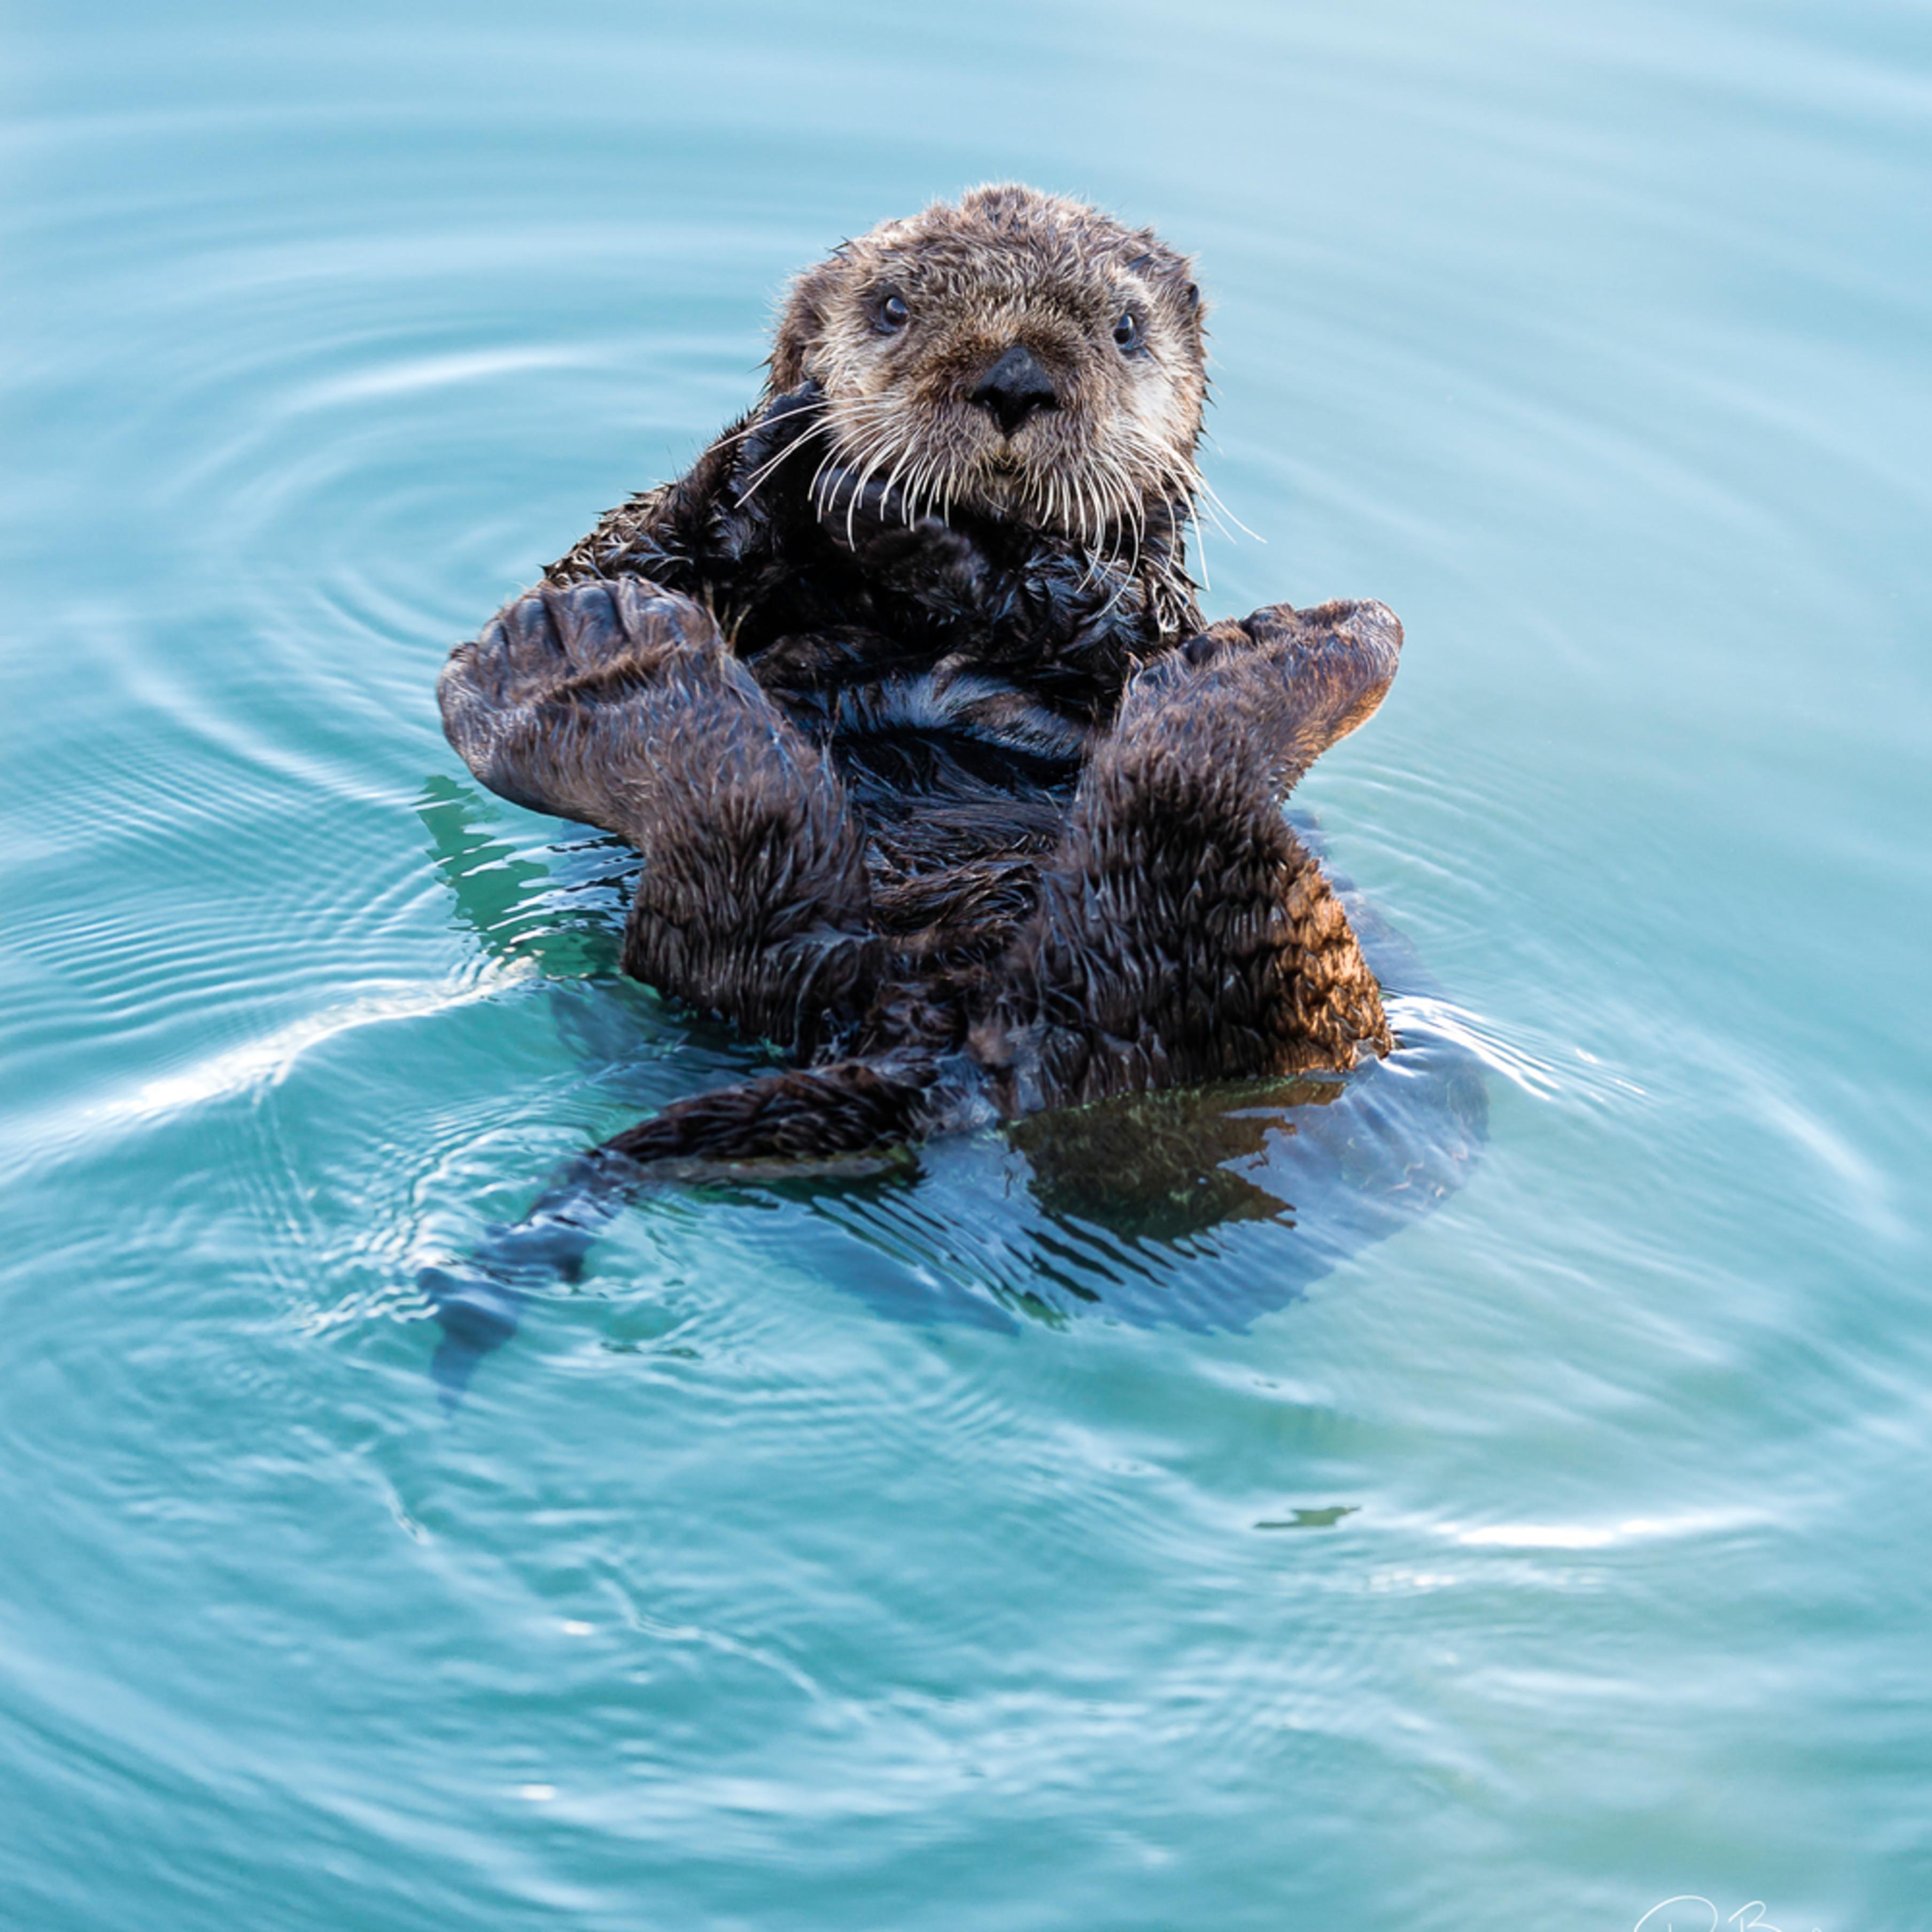 20160607 sea otter 38717 artstorefronts clf1hi